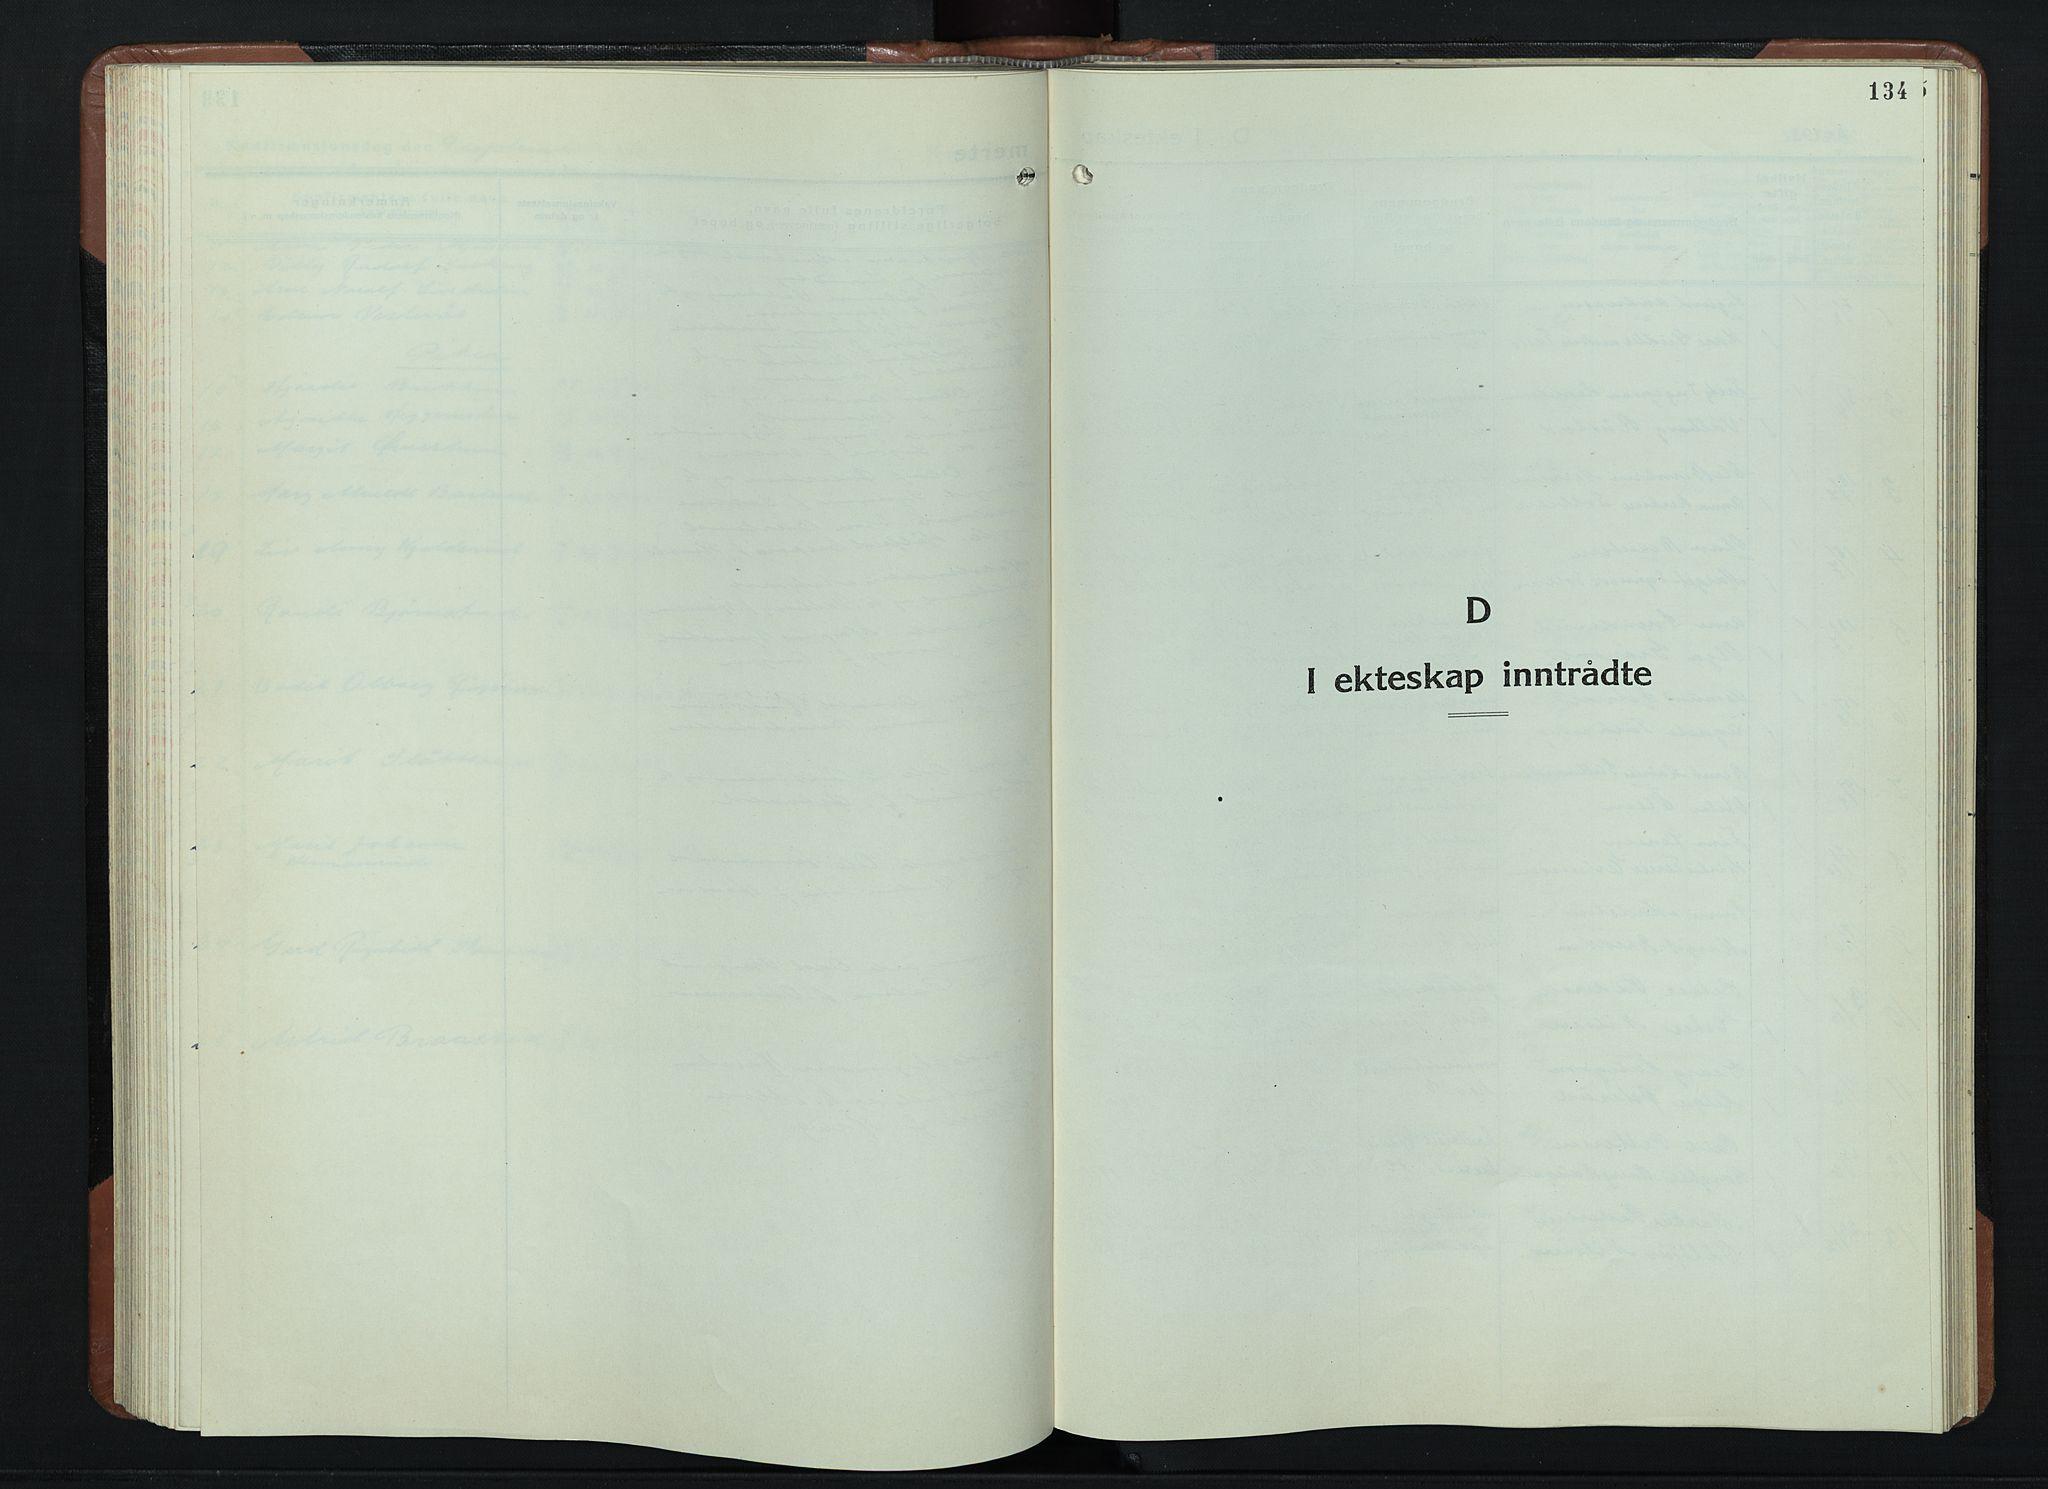 SAH, Vardal prestekontor, H/Ha/Hab/L0018: Klokkerbok nr. 18, 1931-1951, s. 134